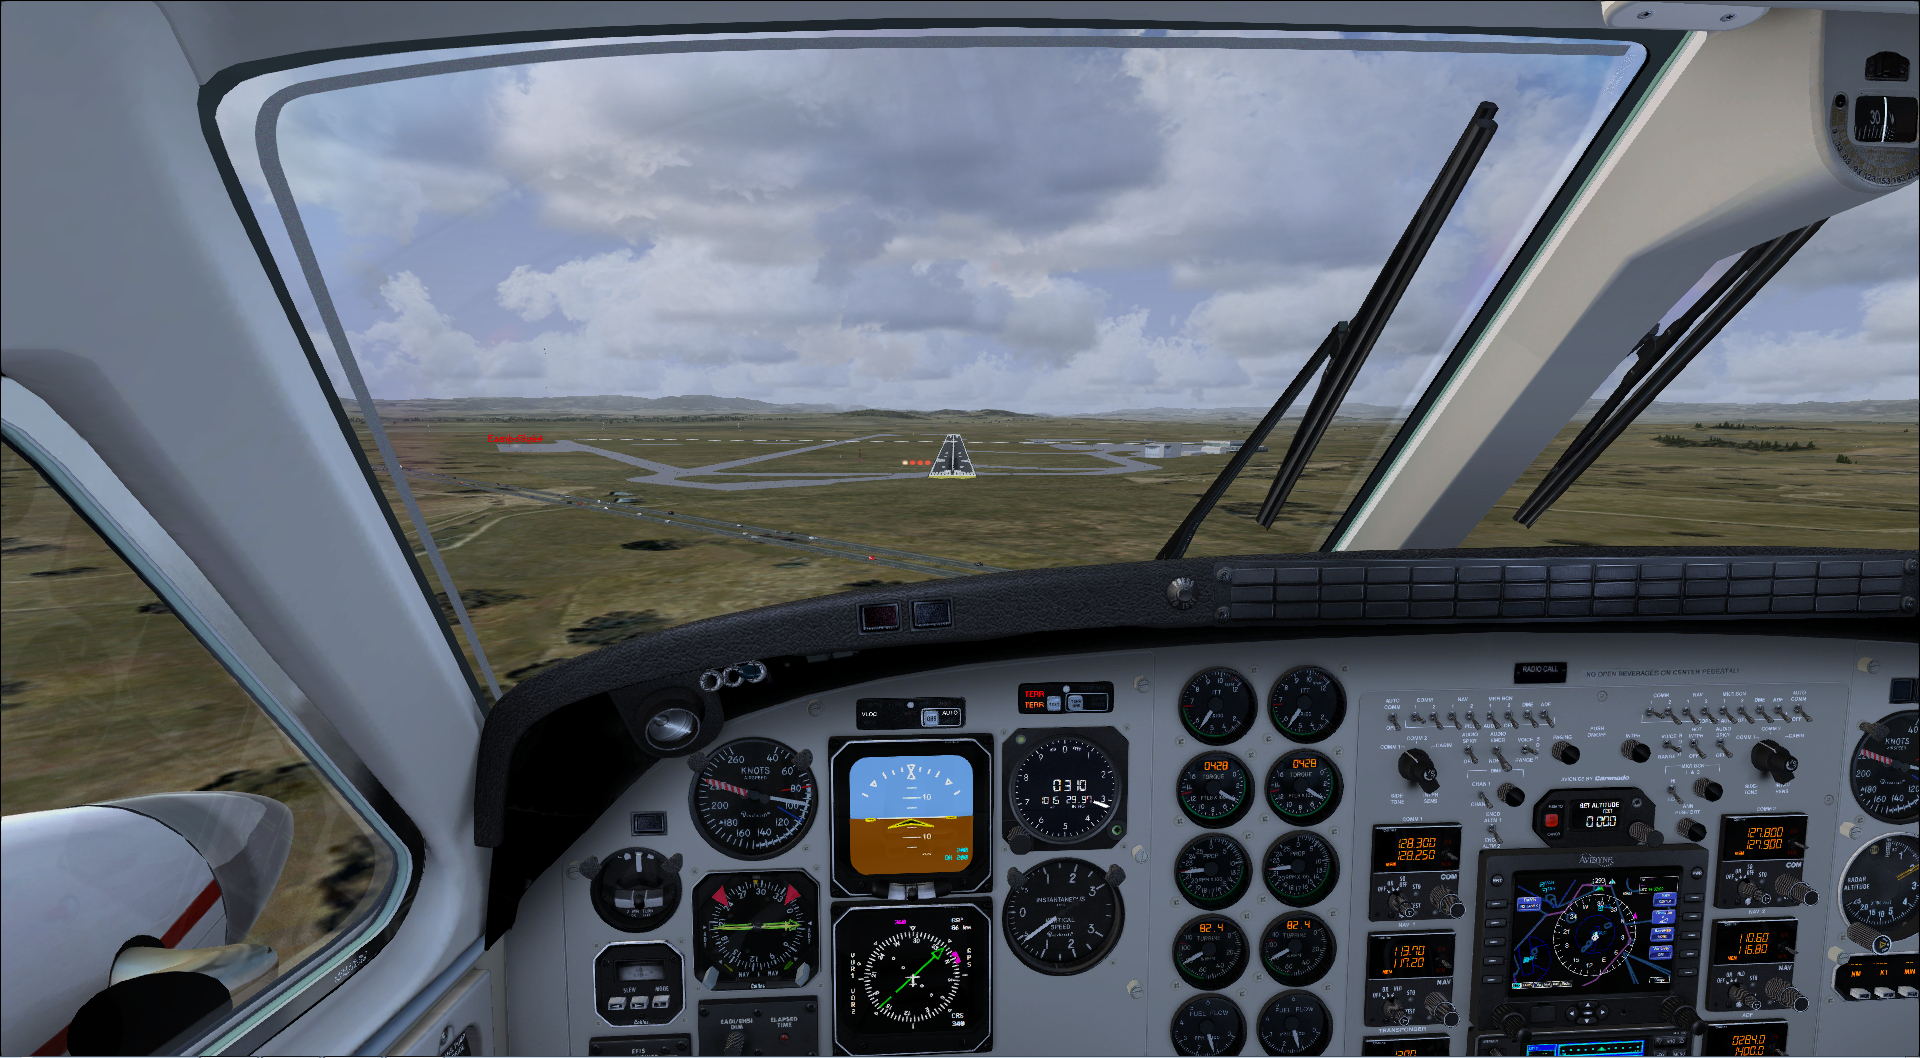 L'Aeropostale 2 eme etape 1225452013118221935277